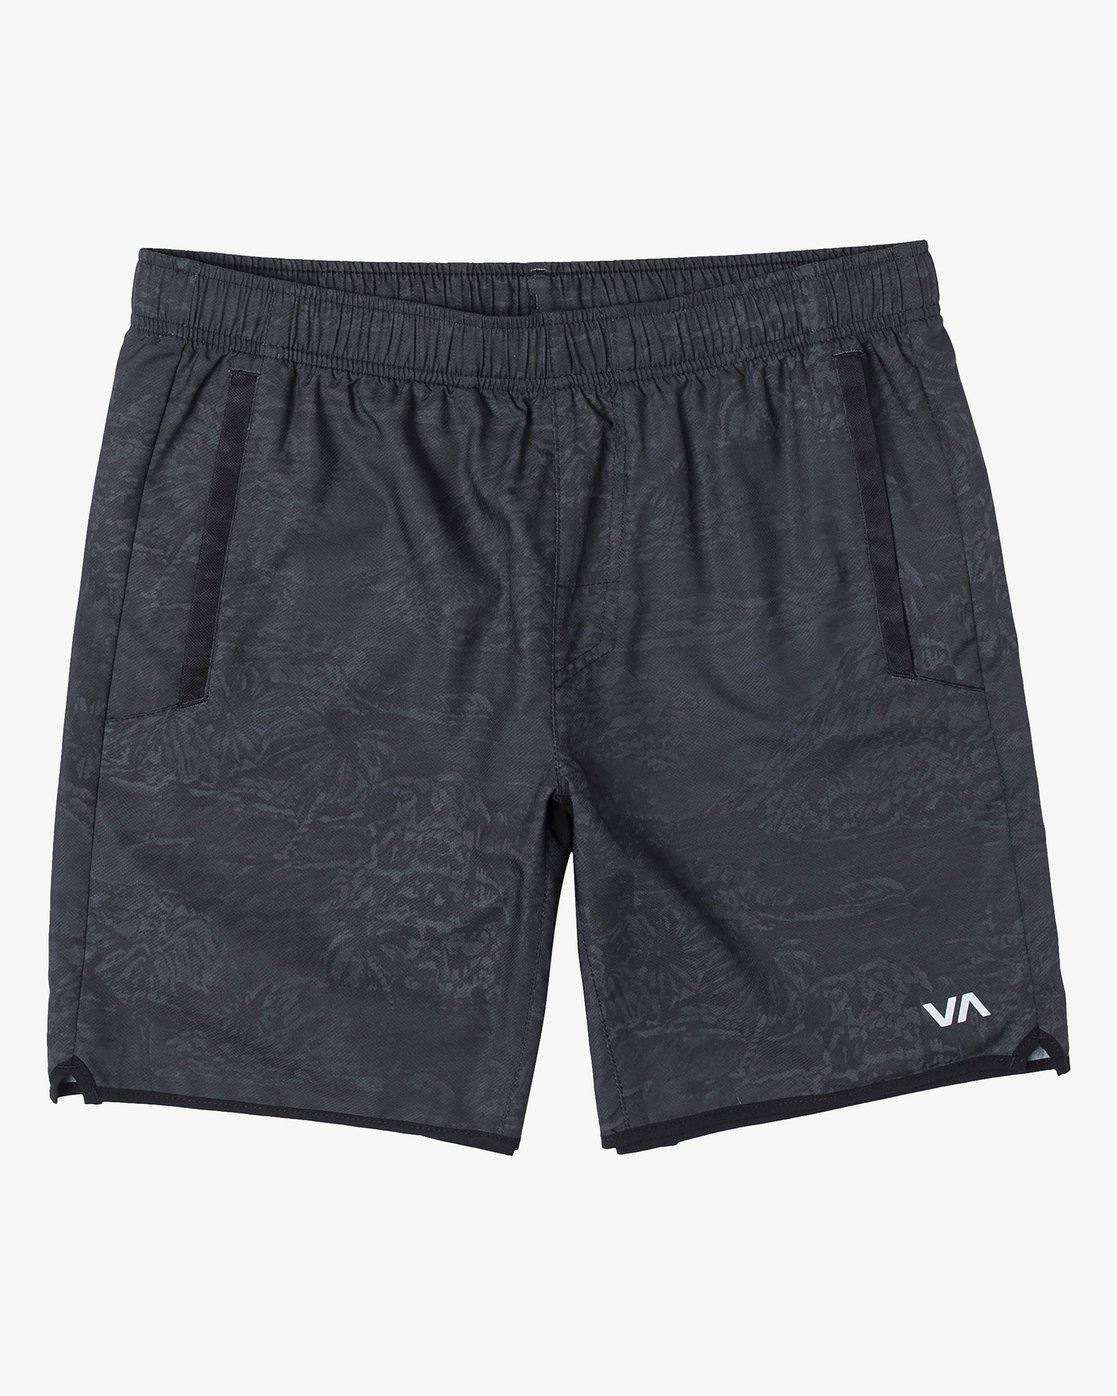 0 VA Sport Yogger - Recycled Performance Training Shorts for Men Green X4WKMARVS1 RVCA